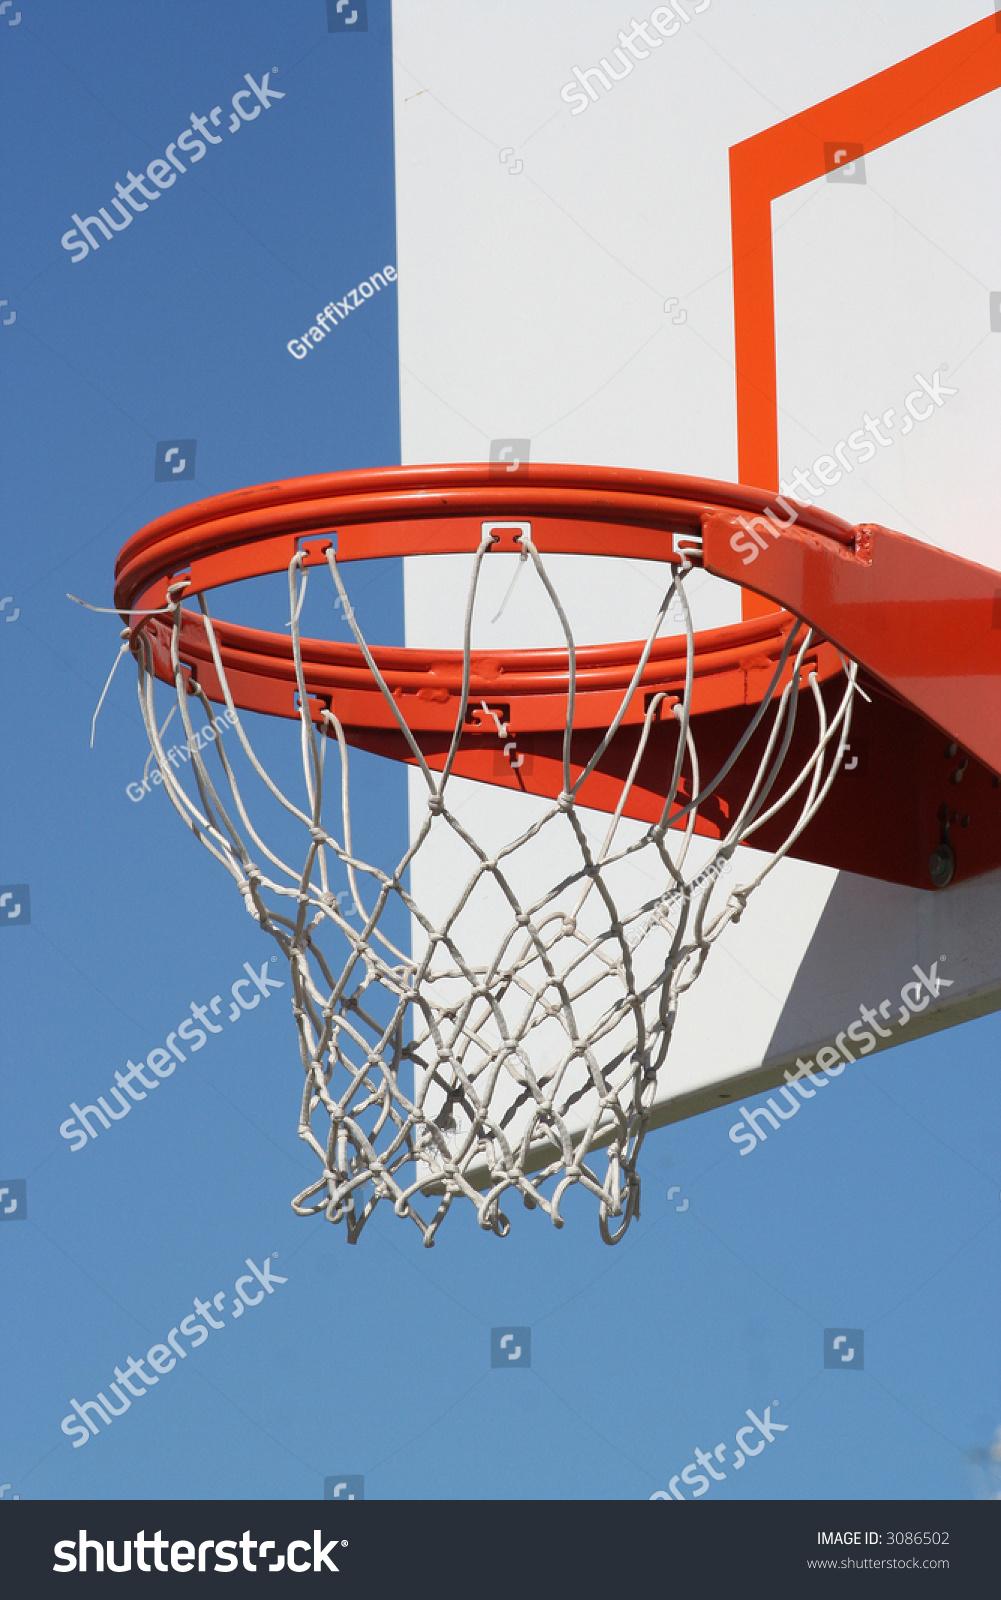 close side view basketball hoop stock photo 3086502 shutterstock